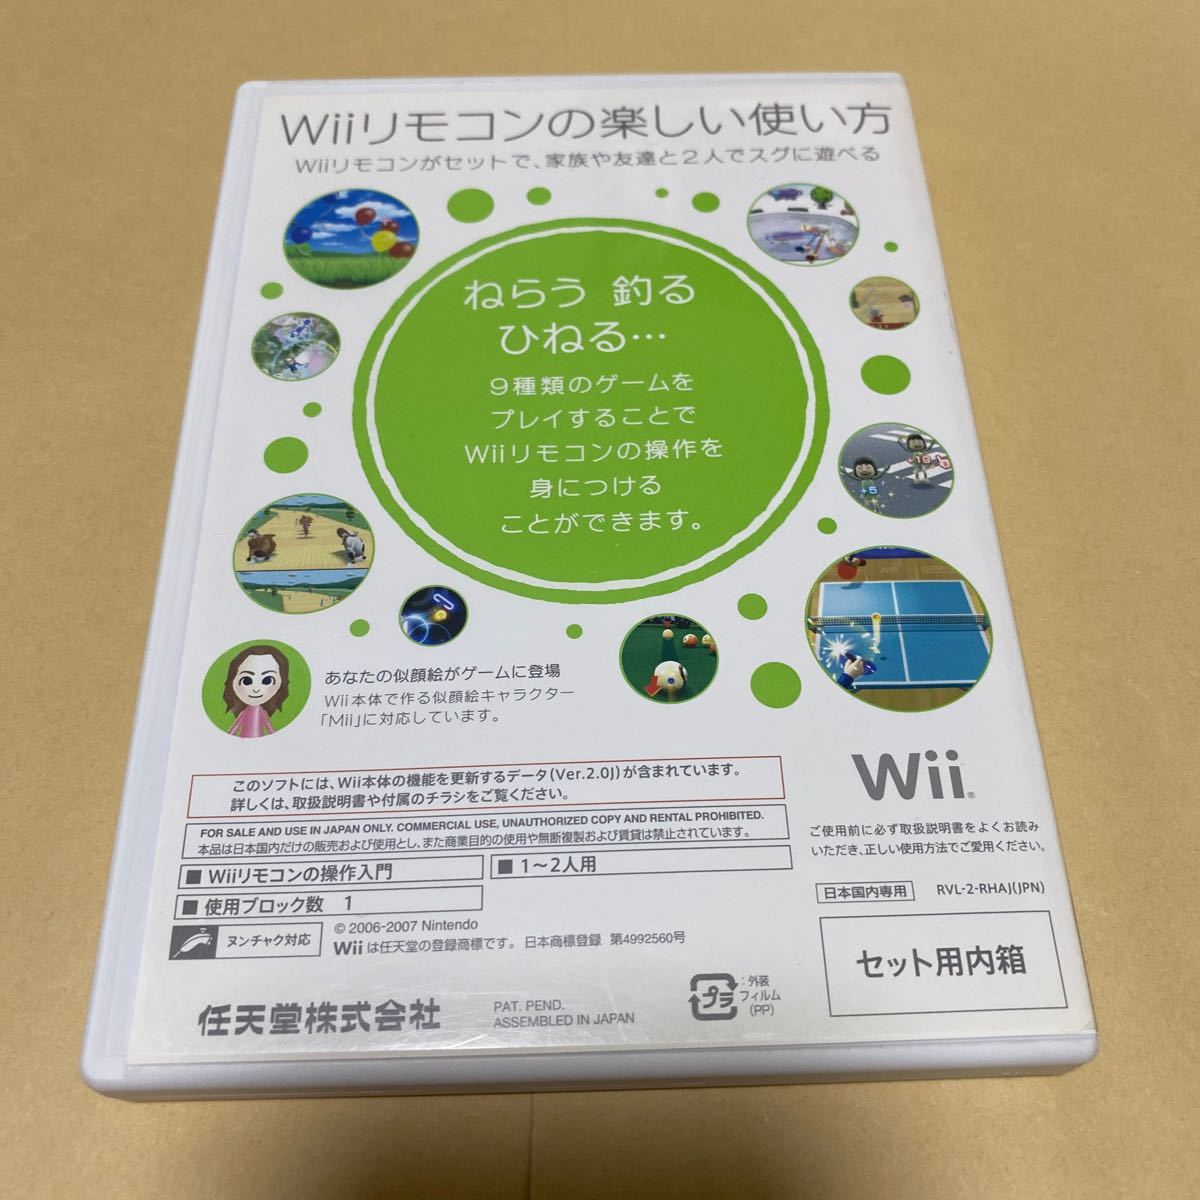 WiiスポーツとはじめてのWii